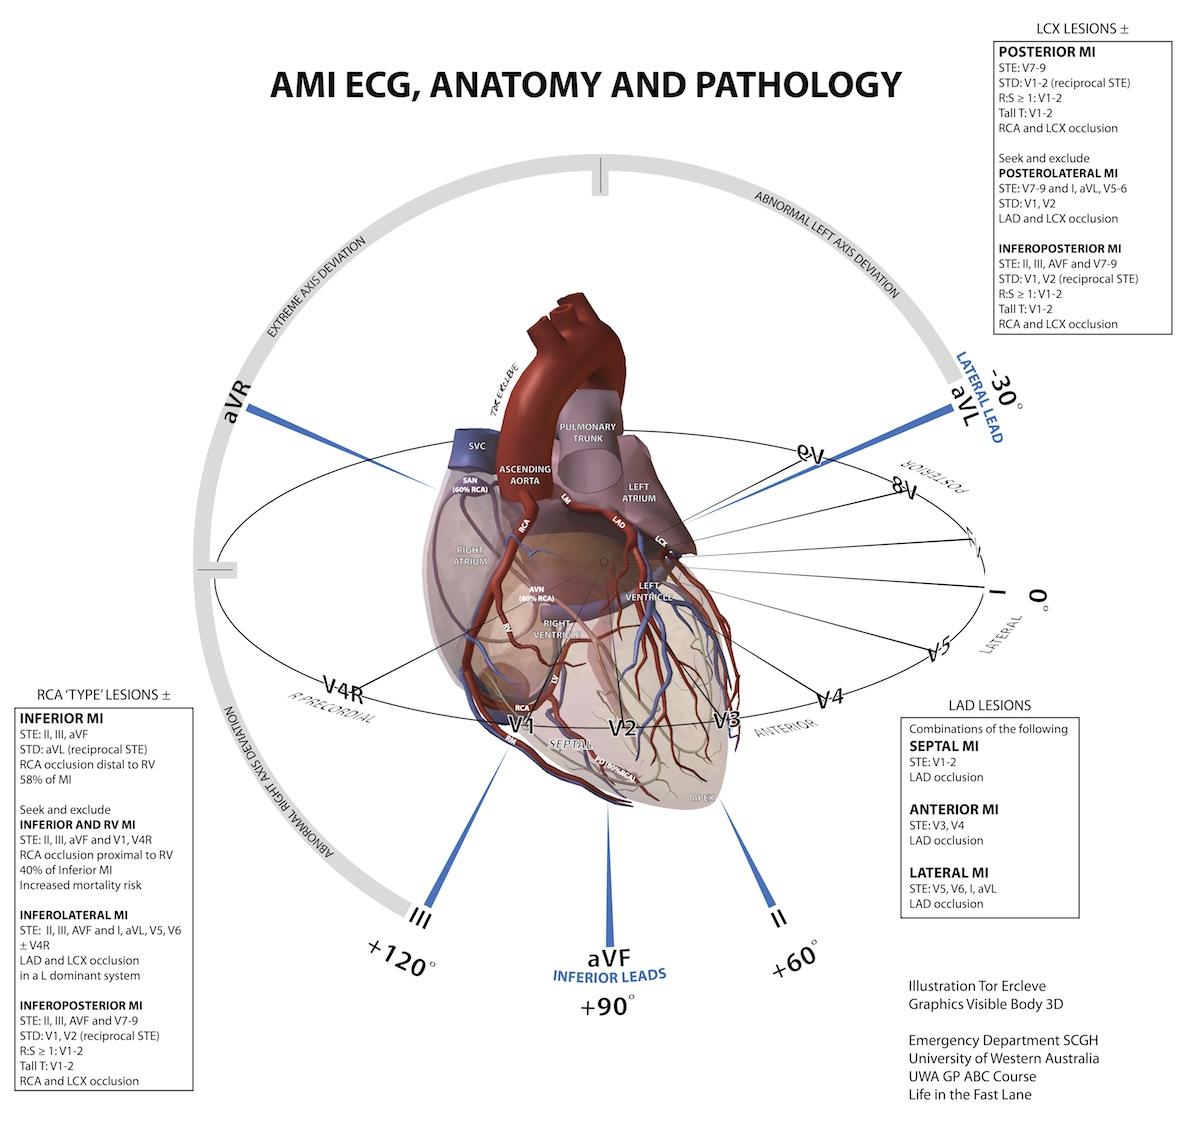 Acute Myocardial Infarction and ECG Geography by Tor Ercleve #Diagnosis #ECG  #EKG #DiagramAcute Myocardial Infarction and ECG Geography by Tor Ercleve #Diagnosis #ECG  #EKG #Diagram